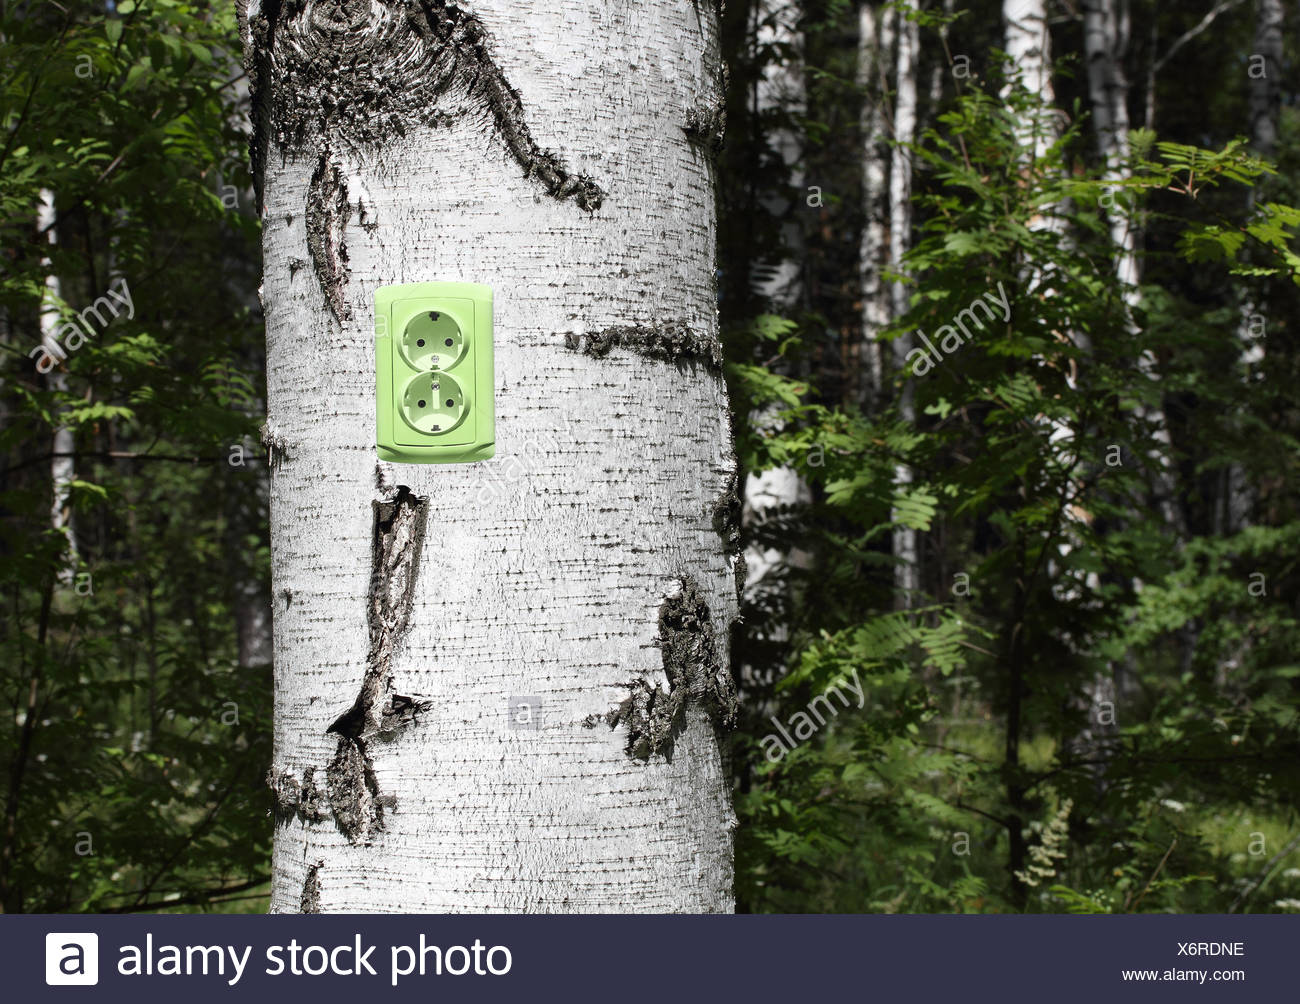 Steckdose an einem Baum Stockbild